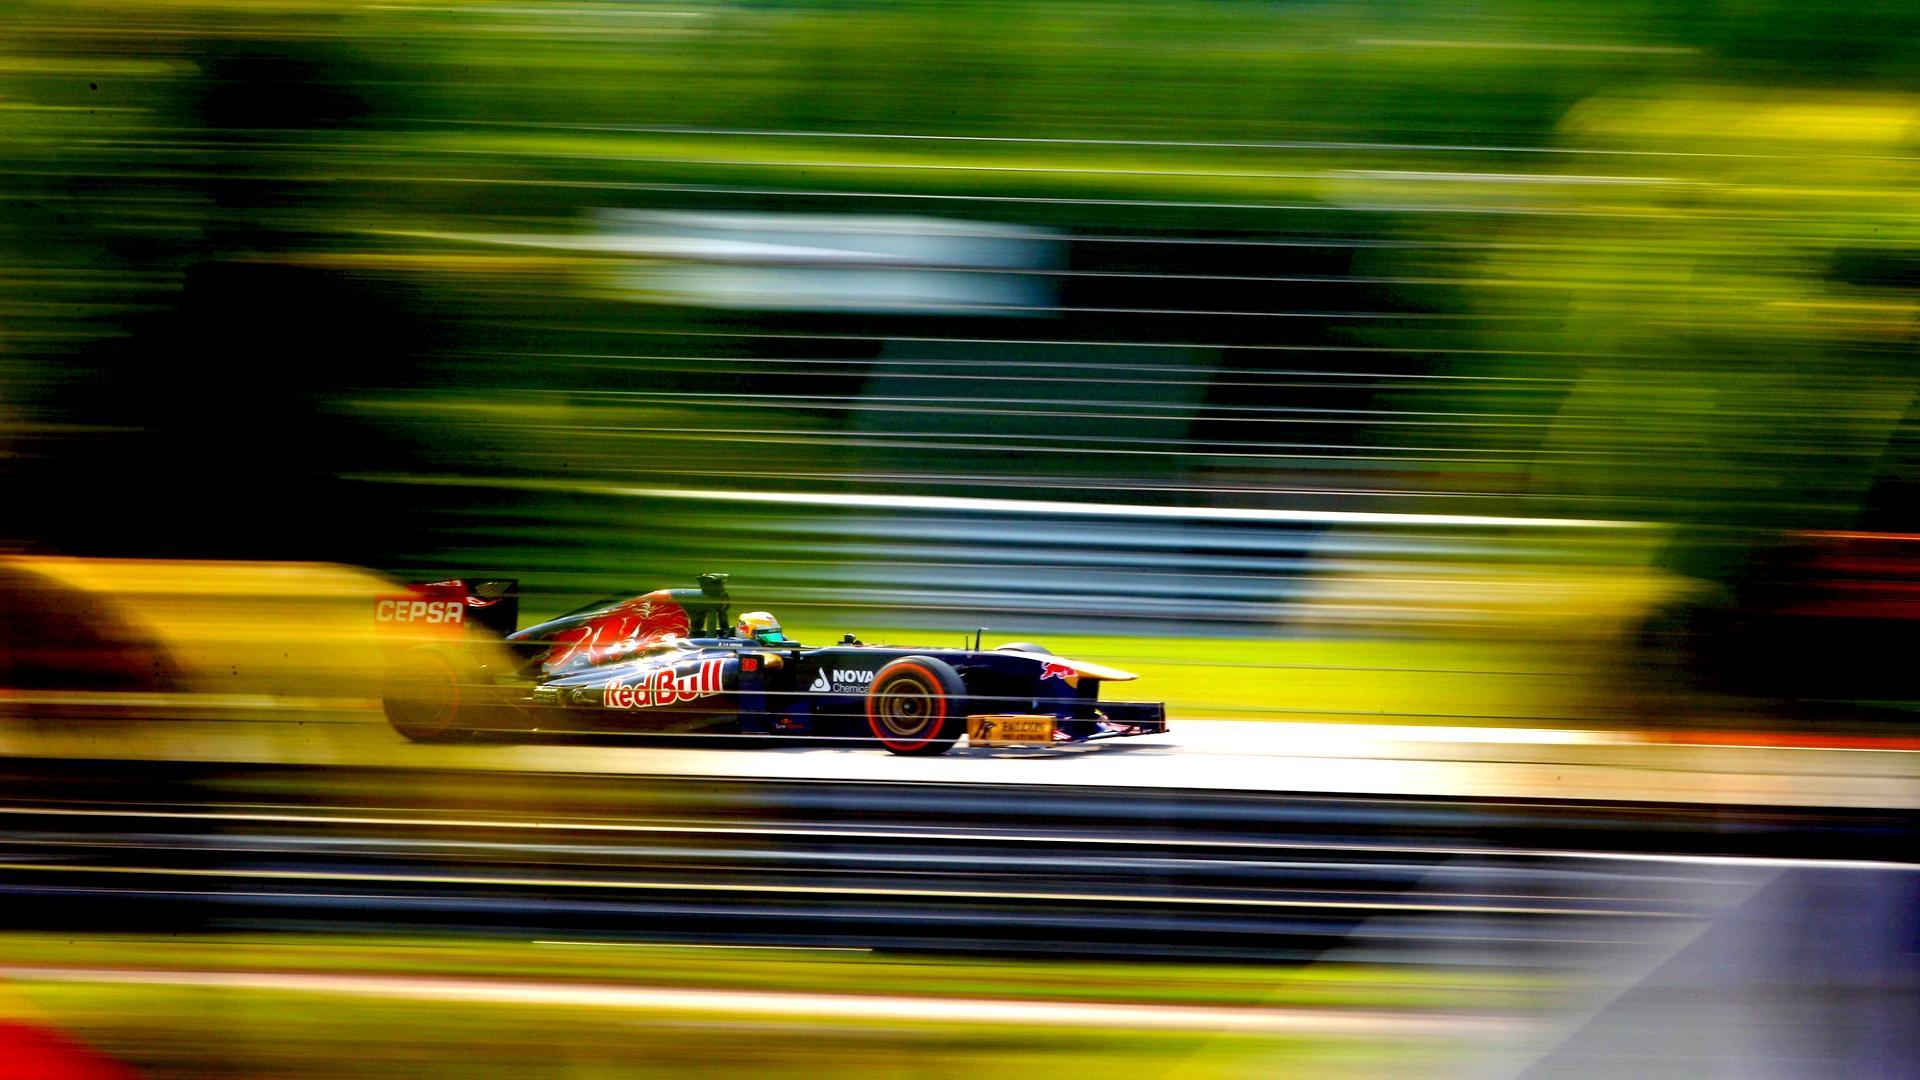 wallpaper : 1920x1080 px, car, formula 1, motion blur, race cars